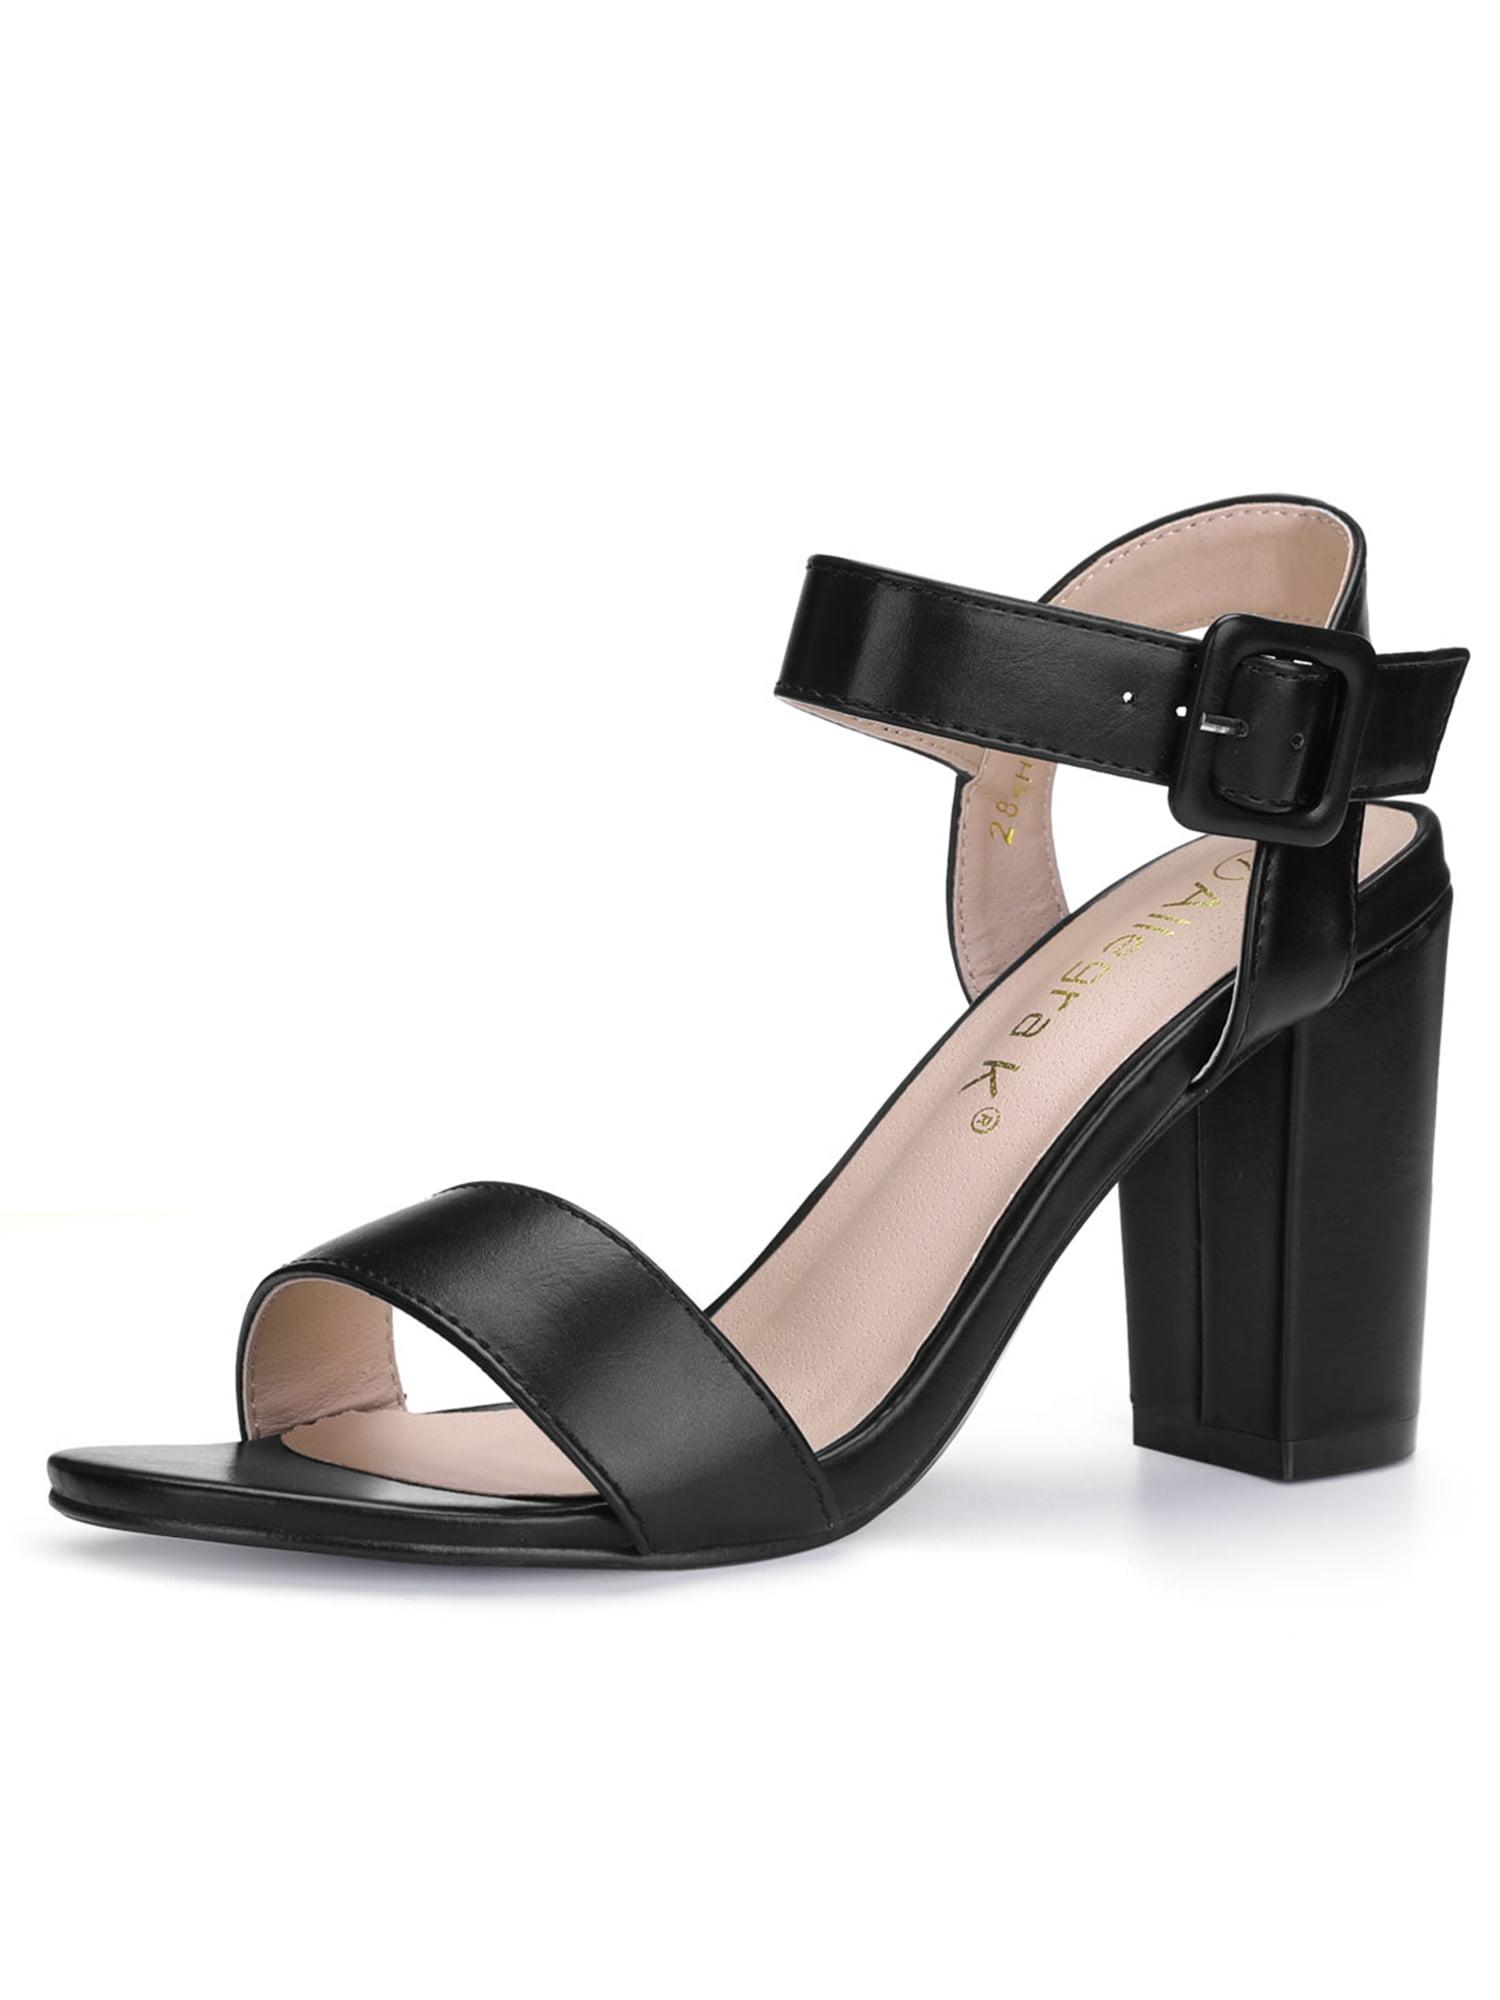 86db1fcfcd45 Unique Bargains Women s Chunky Heel Ankle Strap Dress Sandals Black (Size 8)